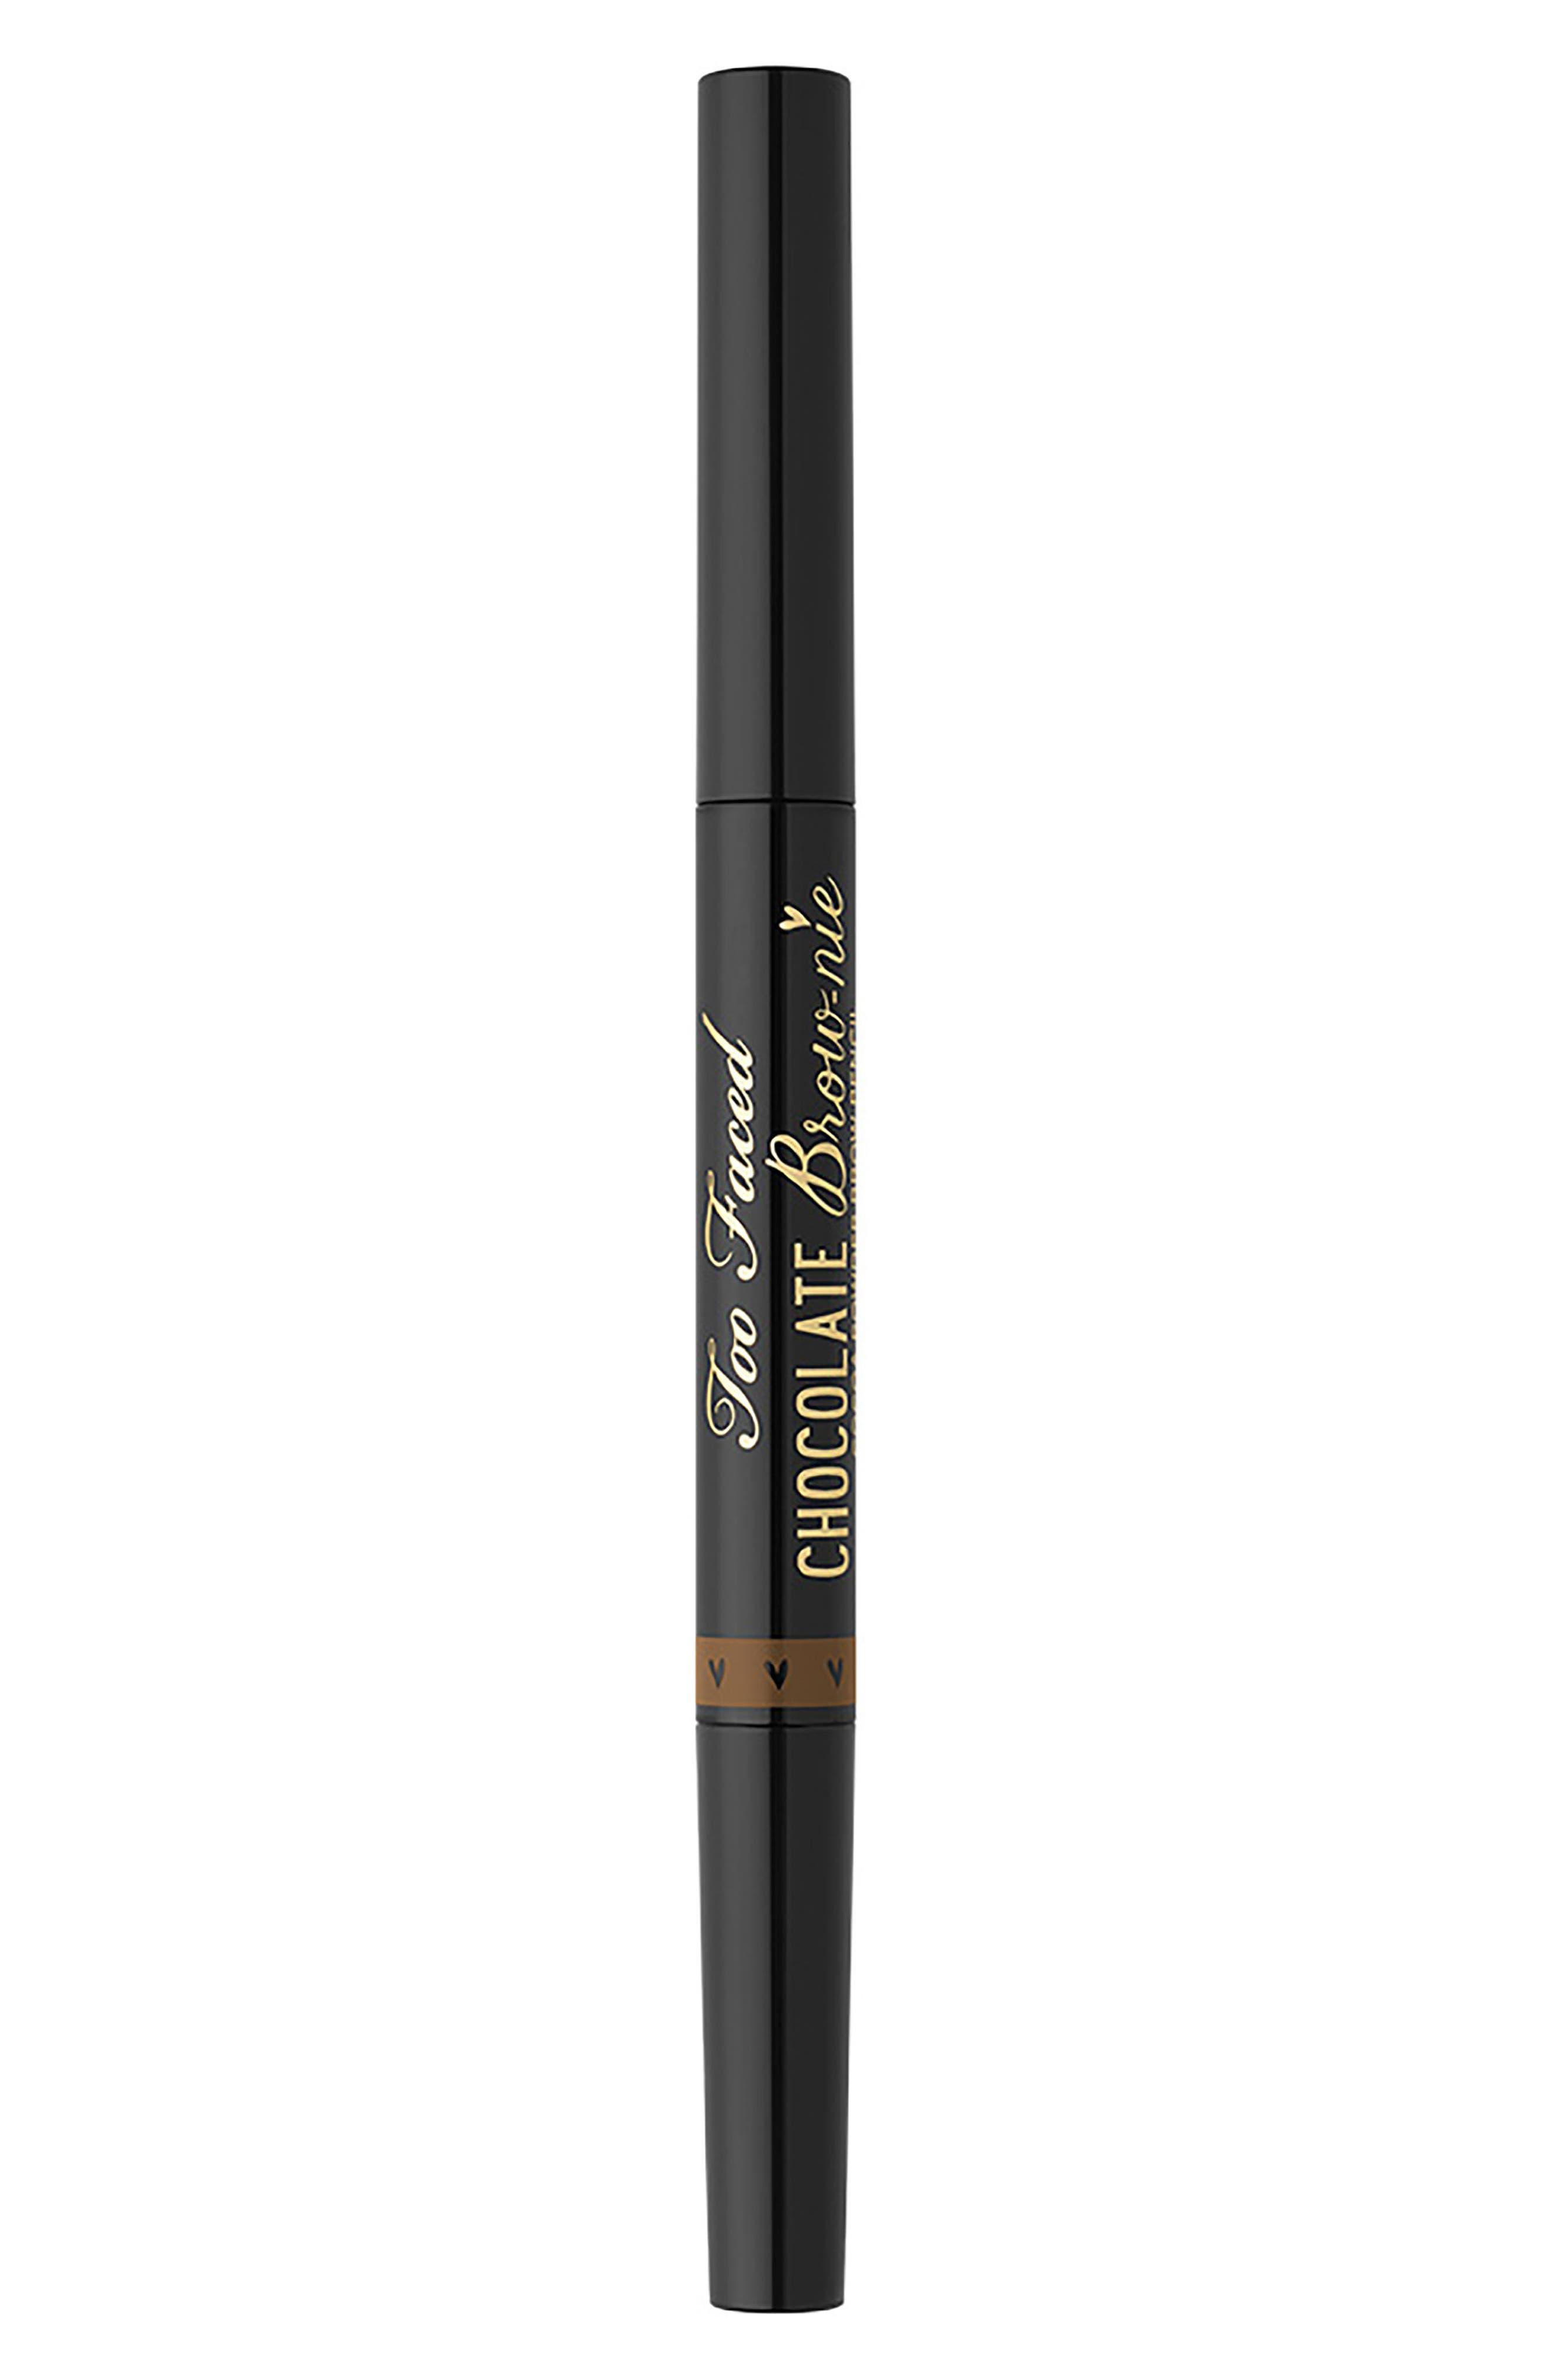 Chocolate Brow-nie Cocoa Powder Brow Pencil,                             Main thumbnail 1, color,                             SOFT BROWN